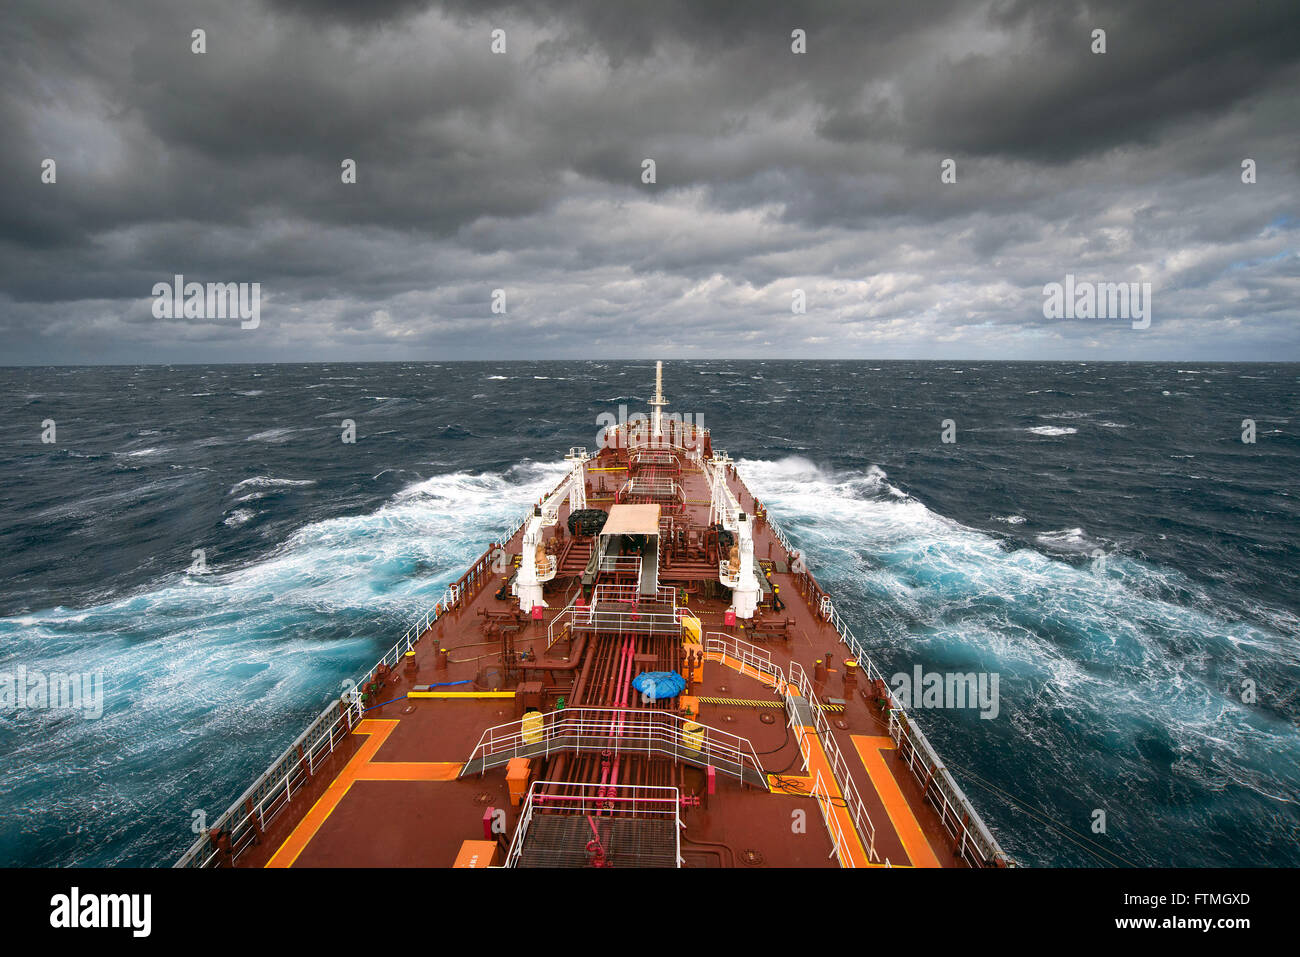 Maisa ship facing bad weather off the coast of Rio Grande do Sul - Stock Image